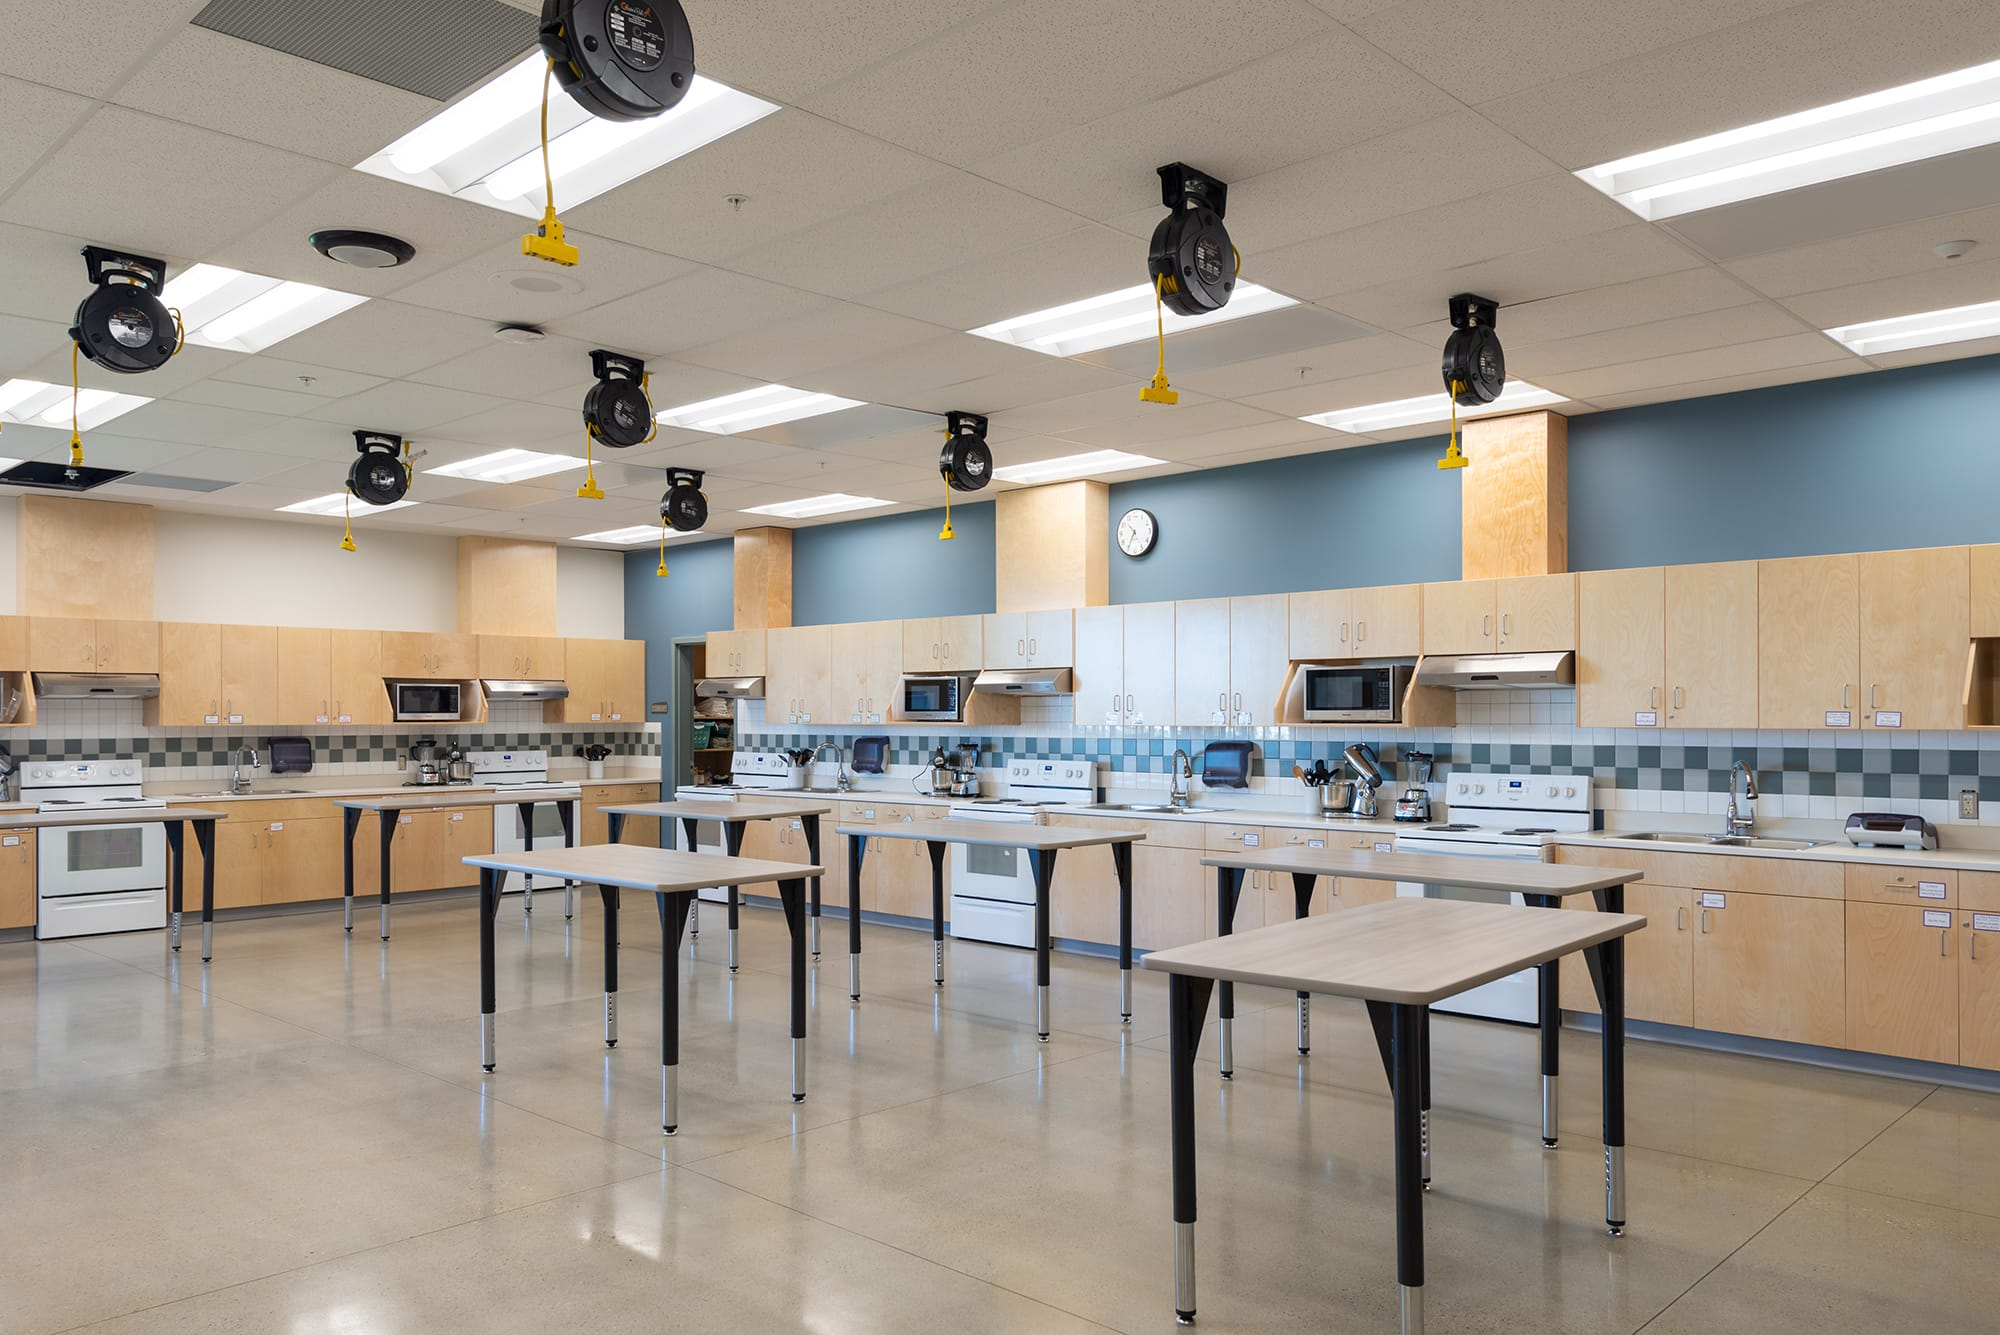 Corpus-Christi-Catholic-School interior kitchen lab